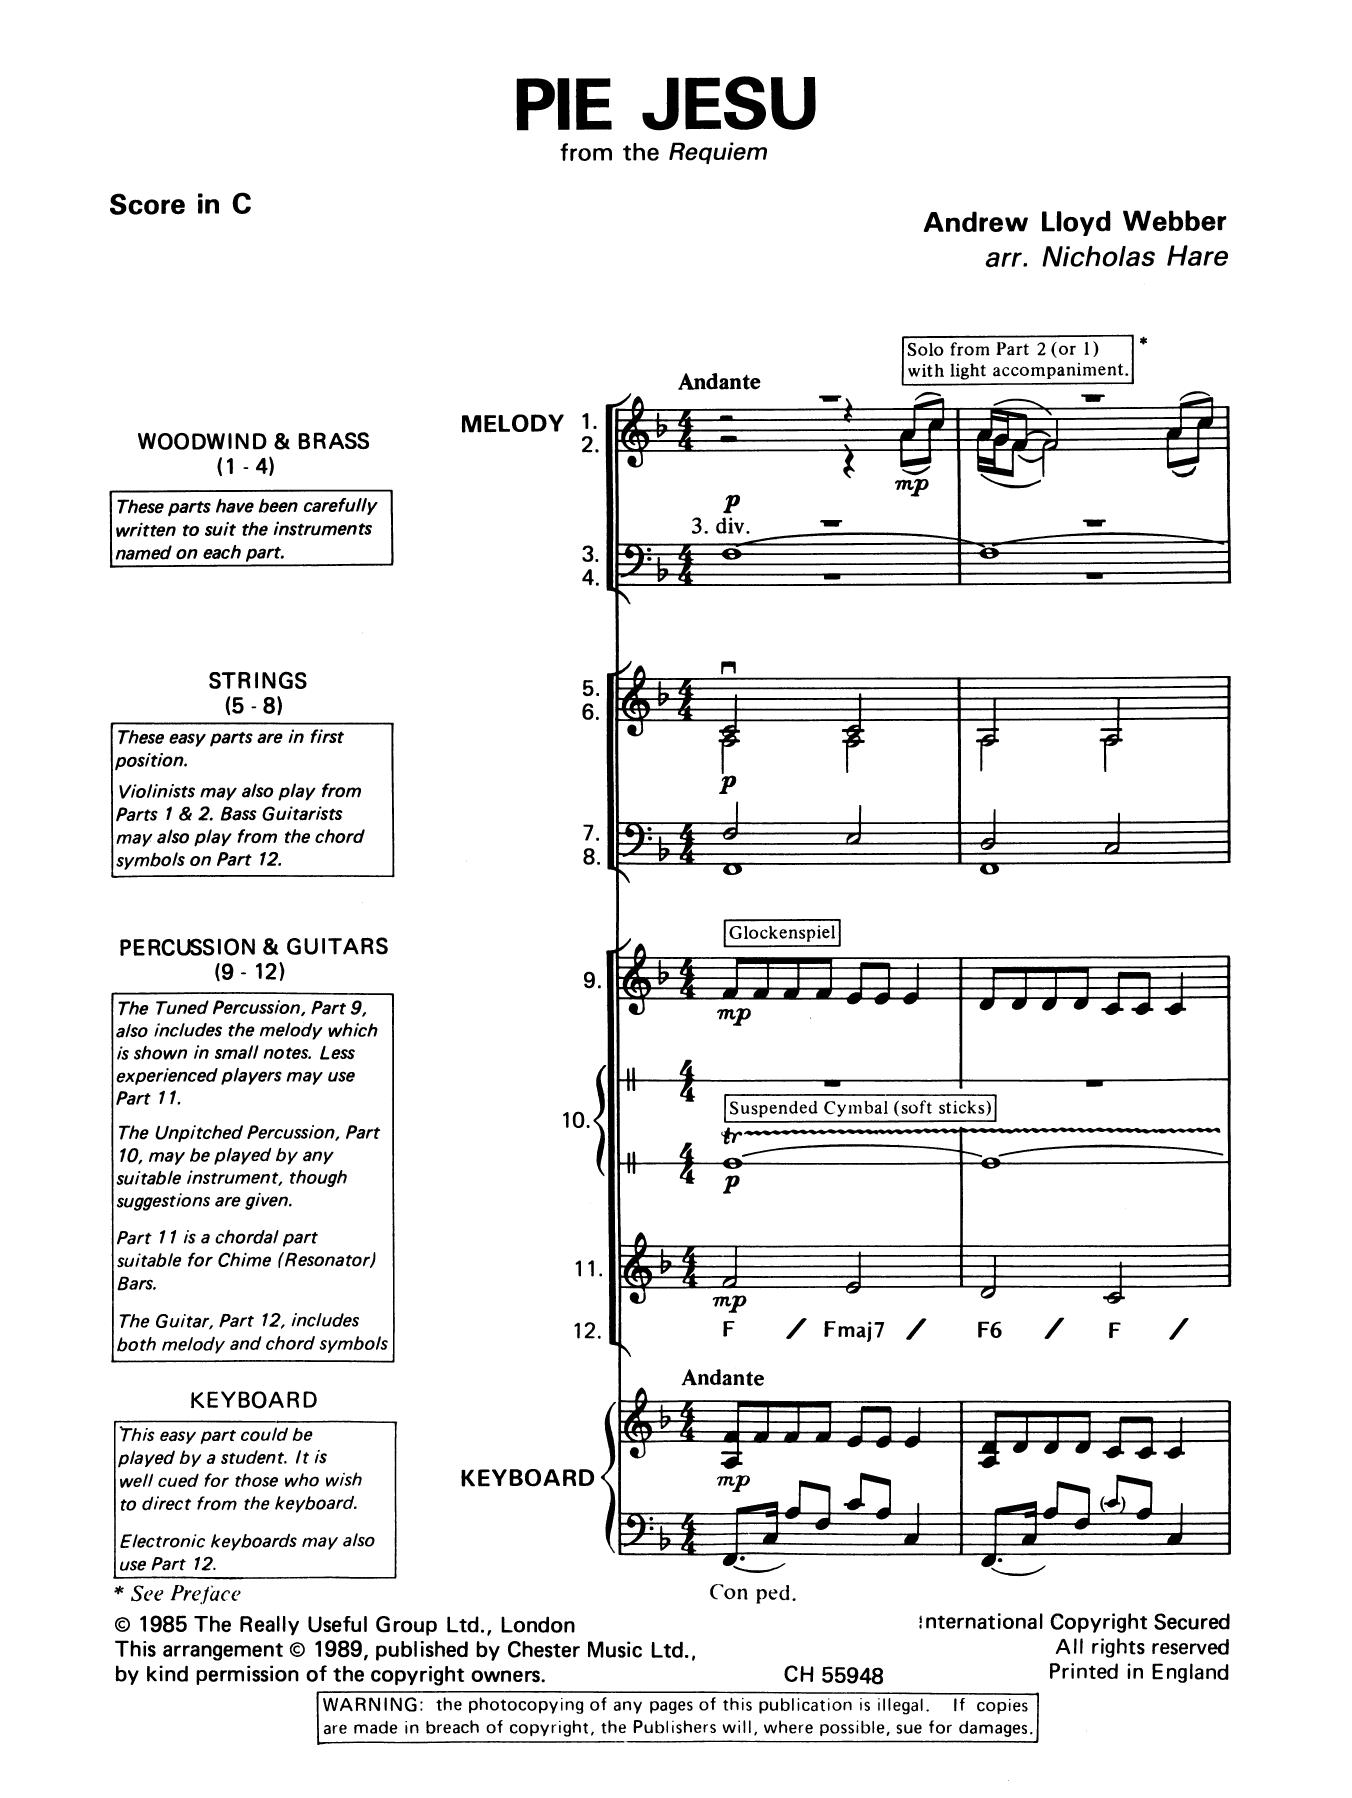 Andrew Lloyd Webber: Pie Jesu (from Requiem)